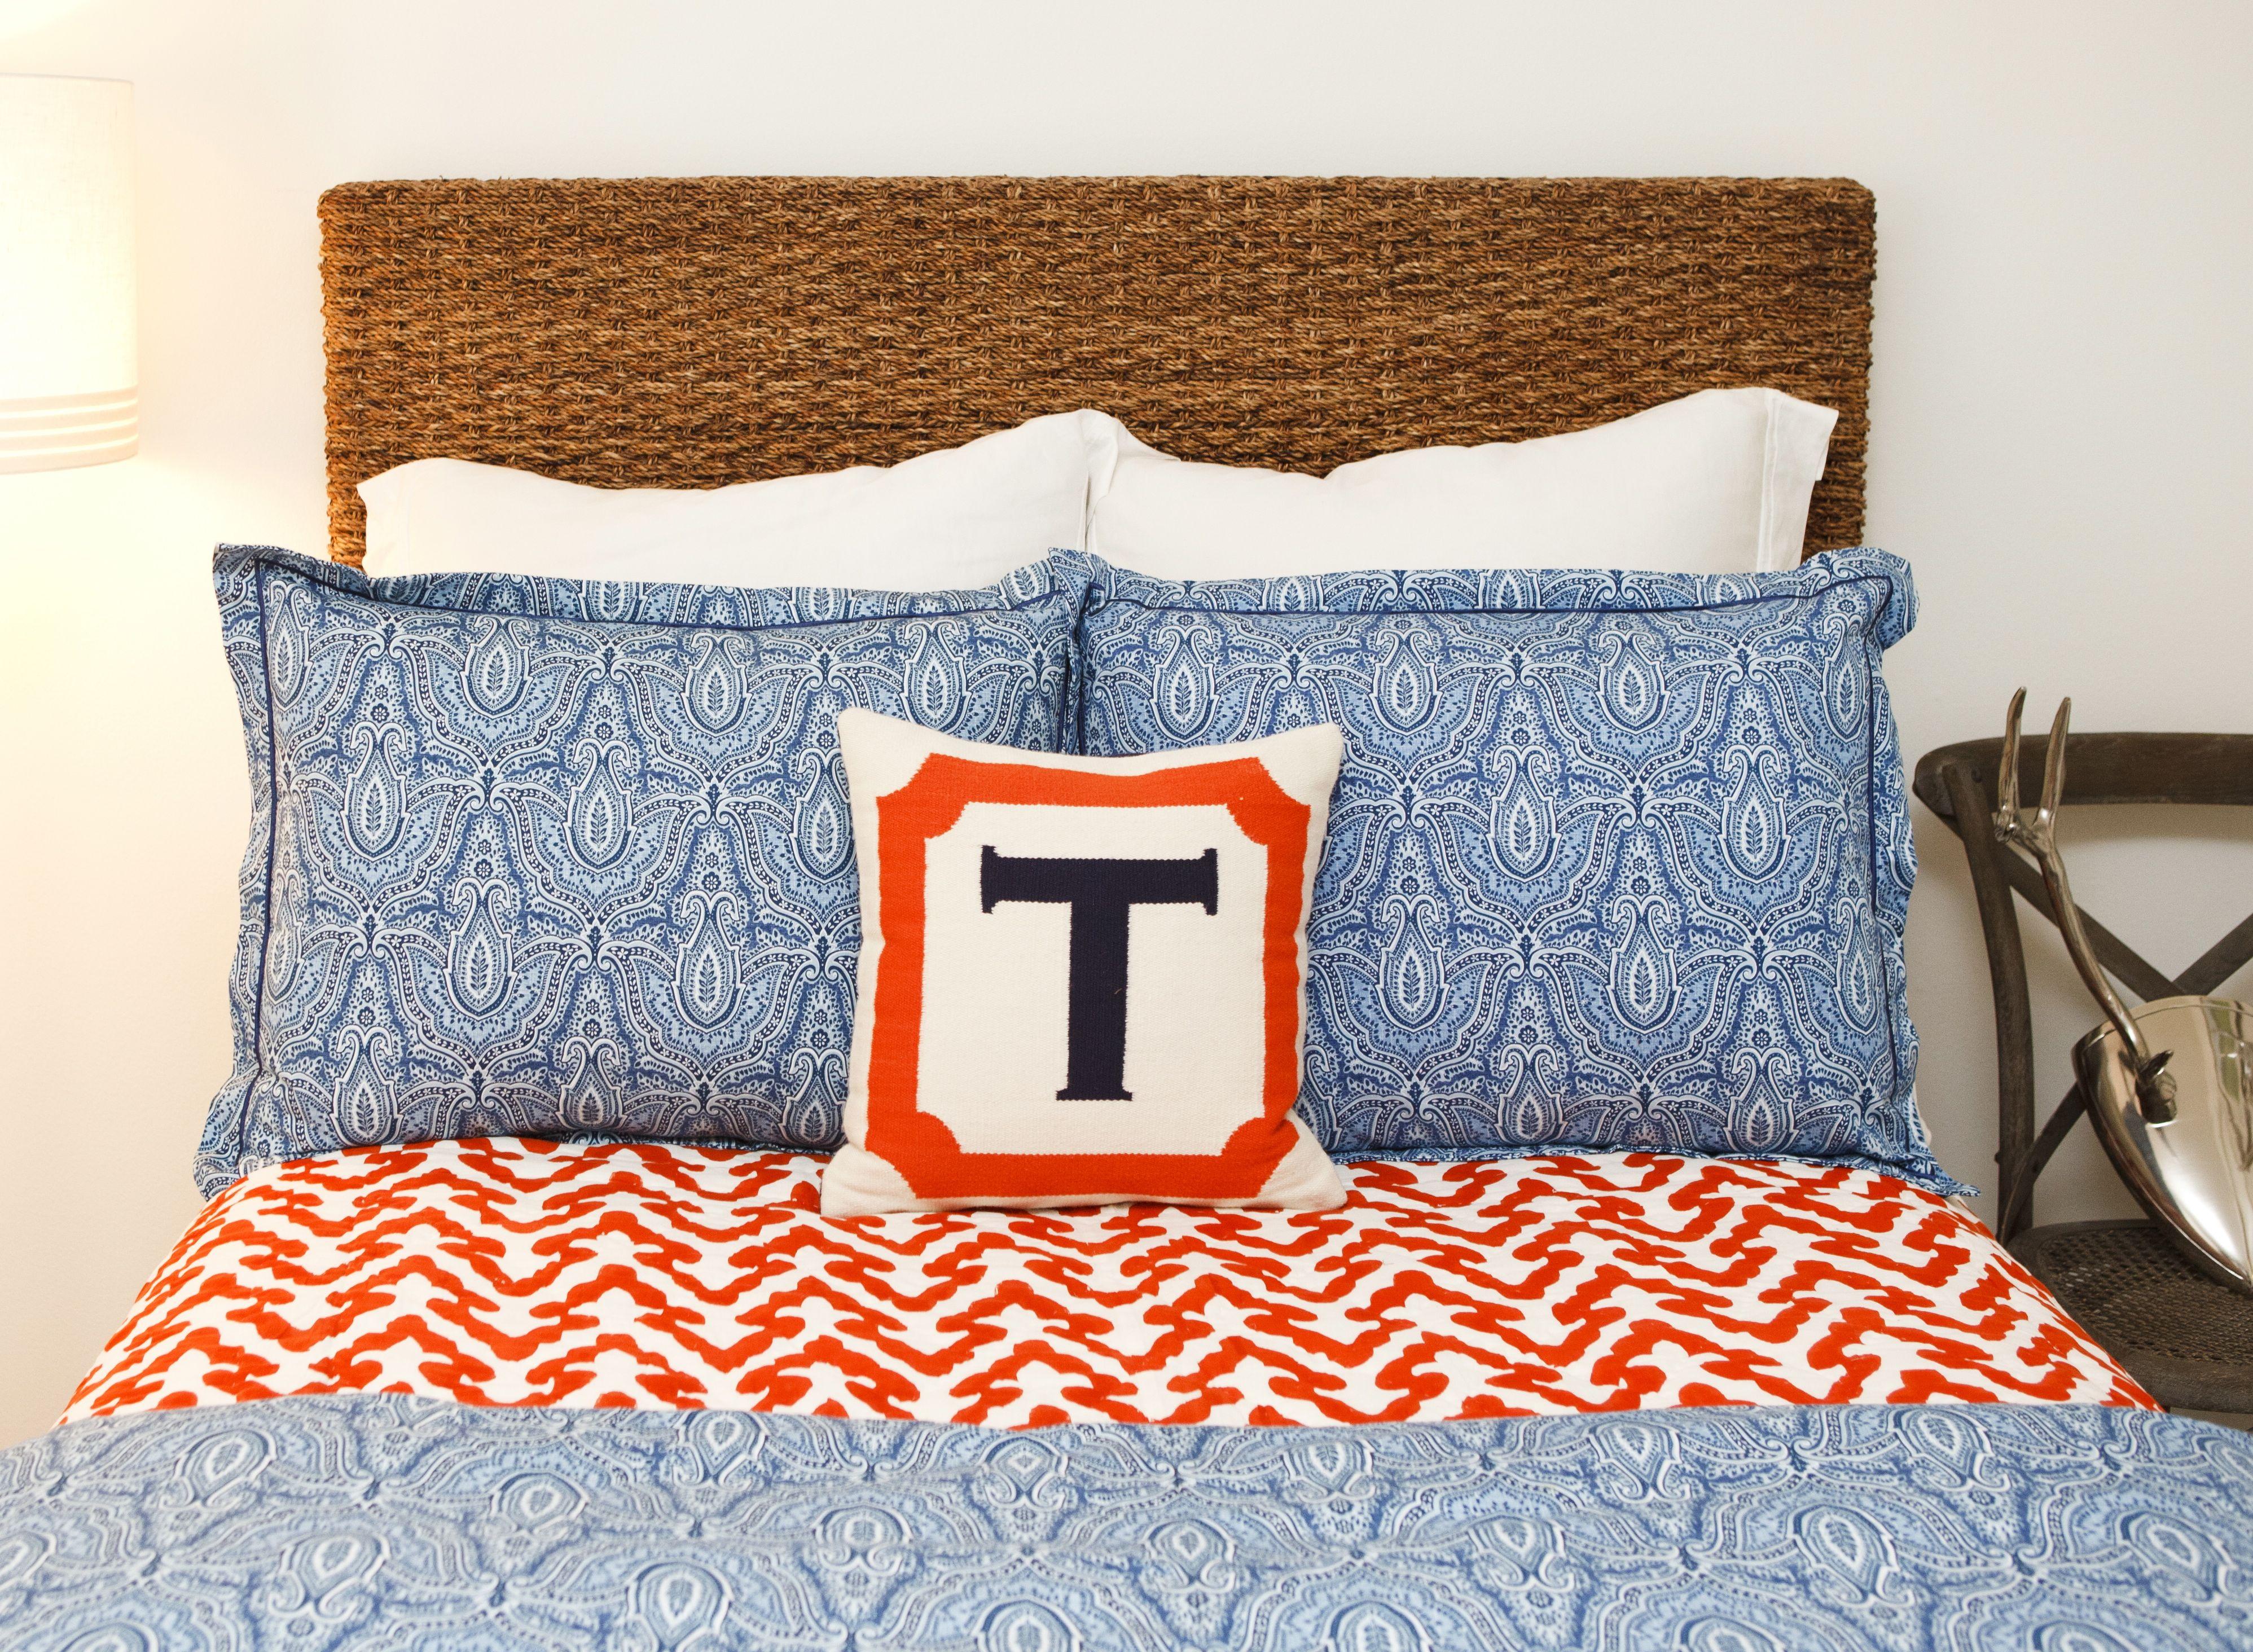 Jonathan Adler Initial Pillow